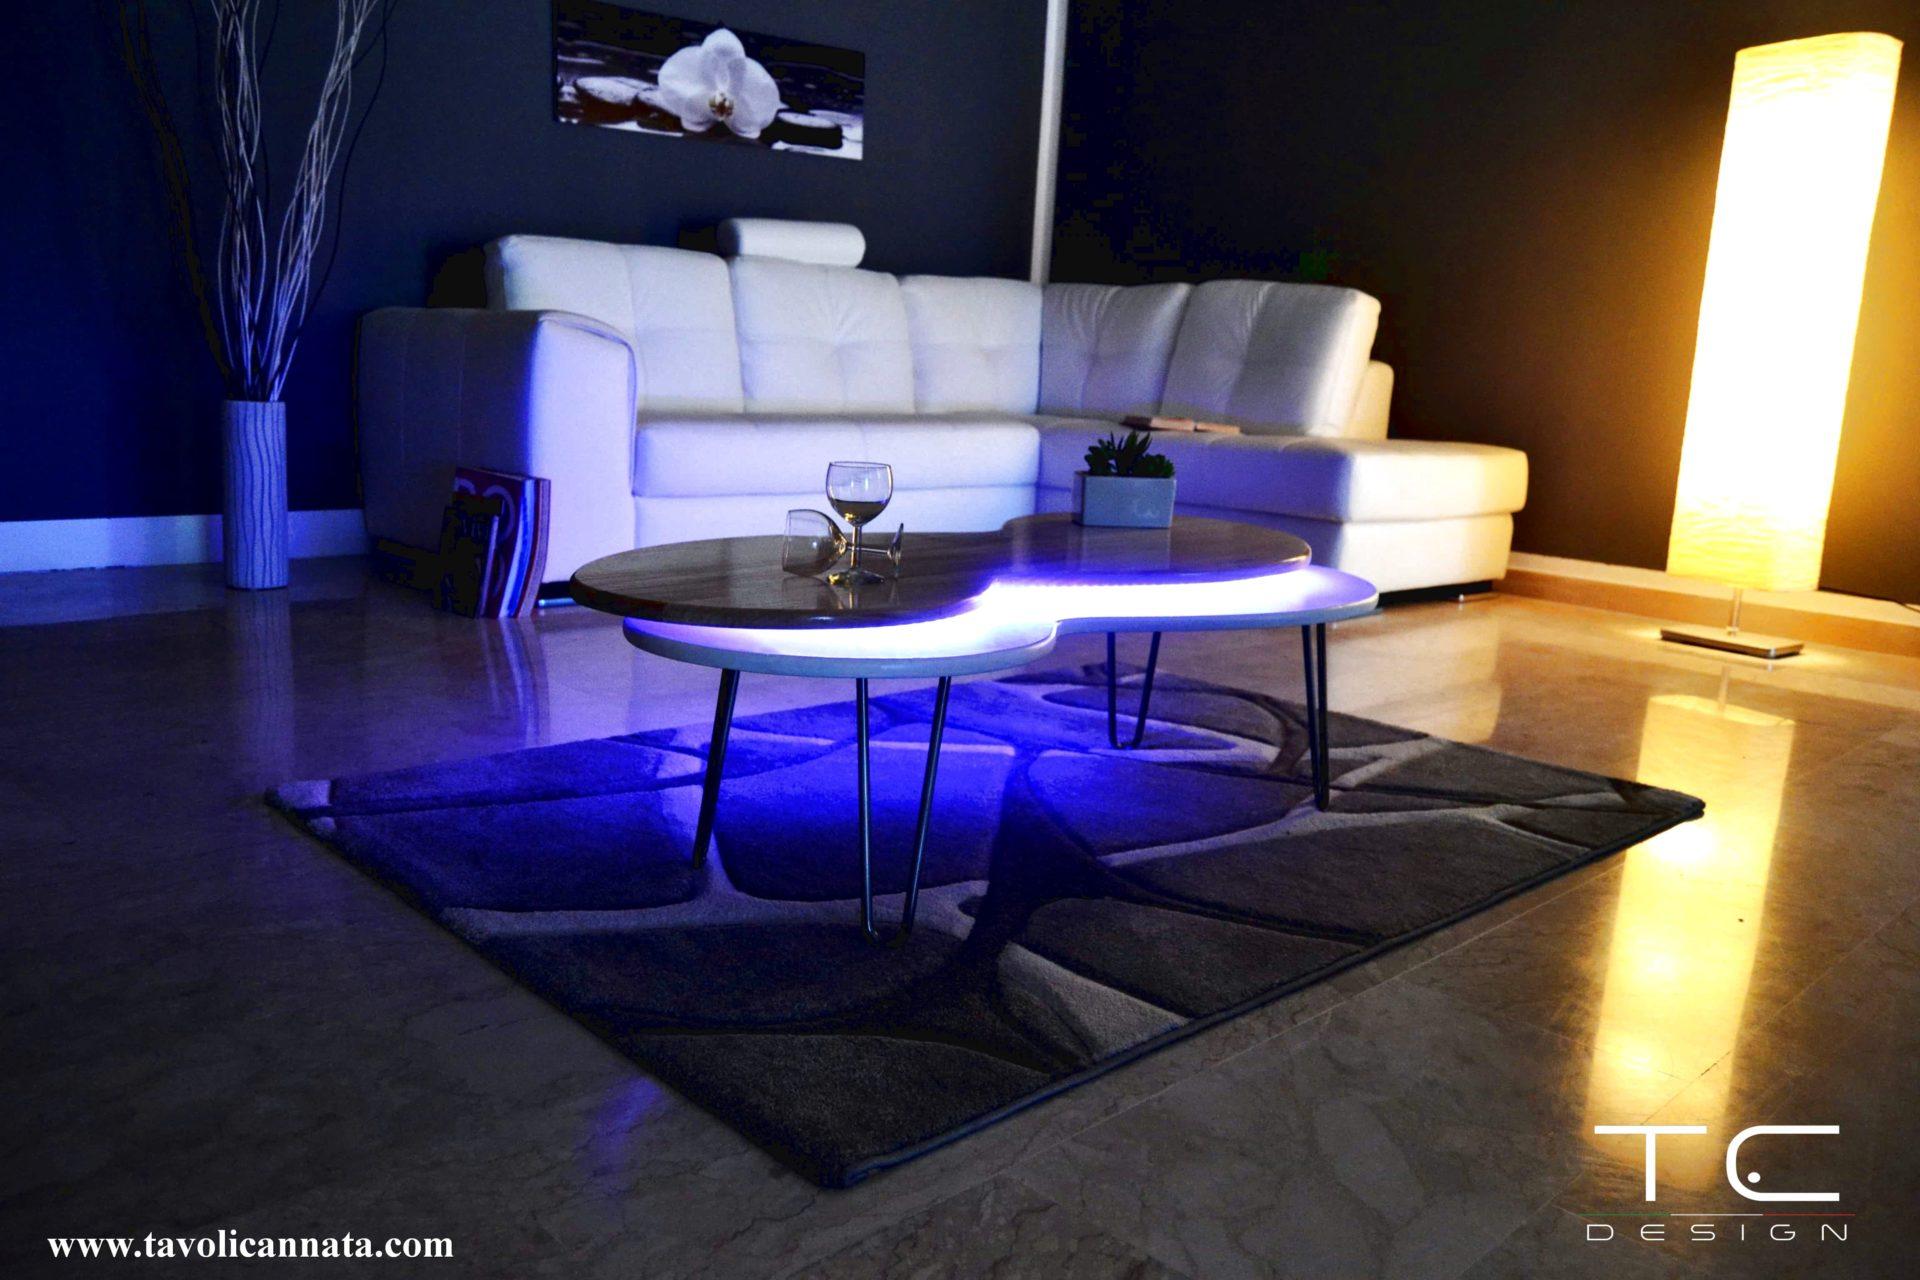 Tavolini da caffe moderni di design - Tavolini Cannata